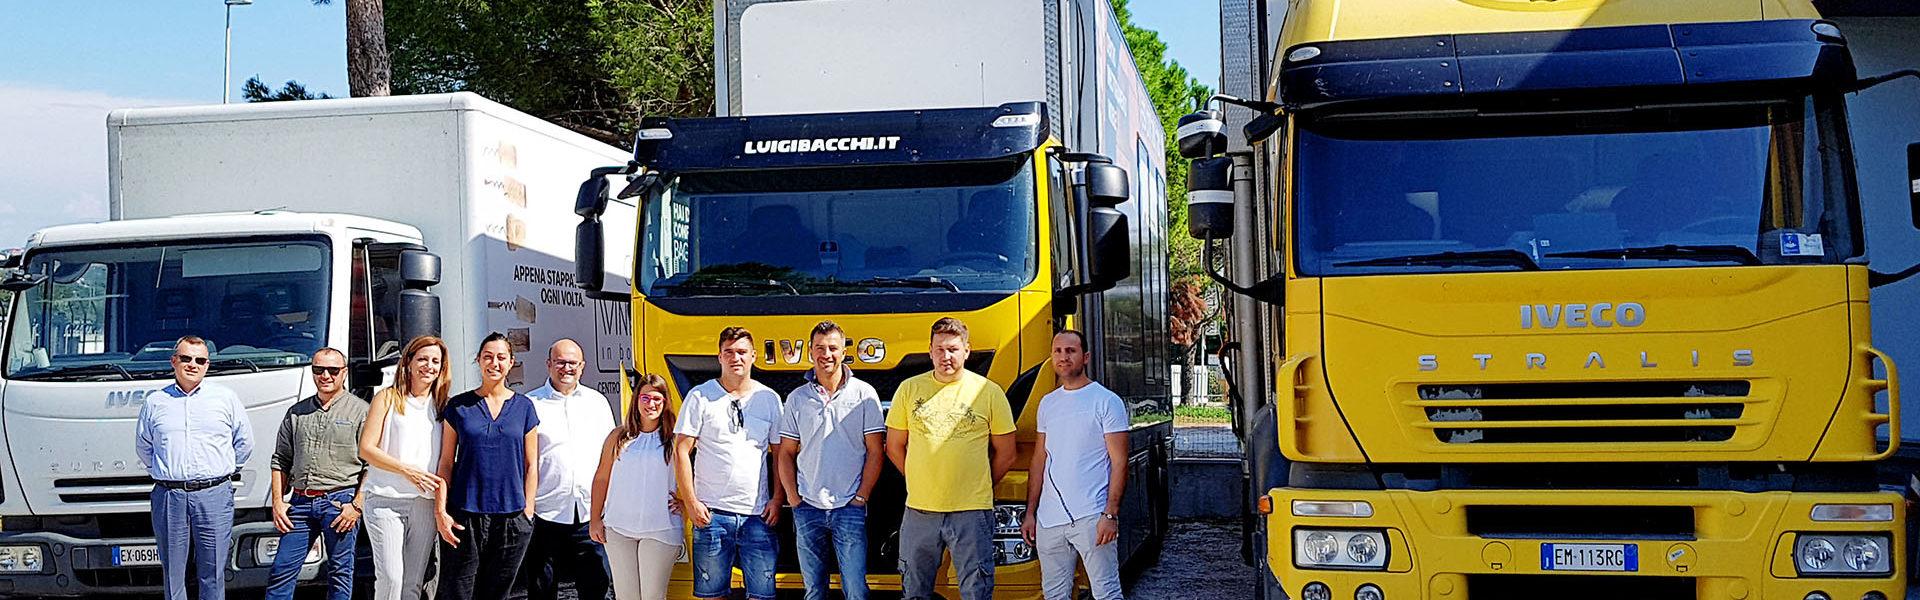 Enotech imbottigliamento mobile team